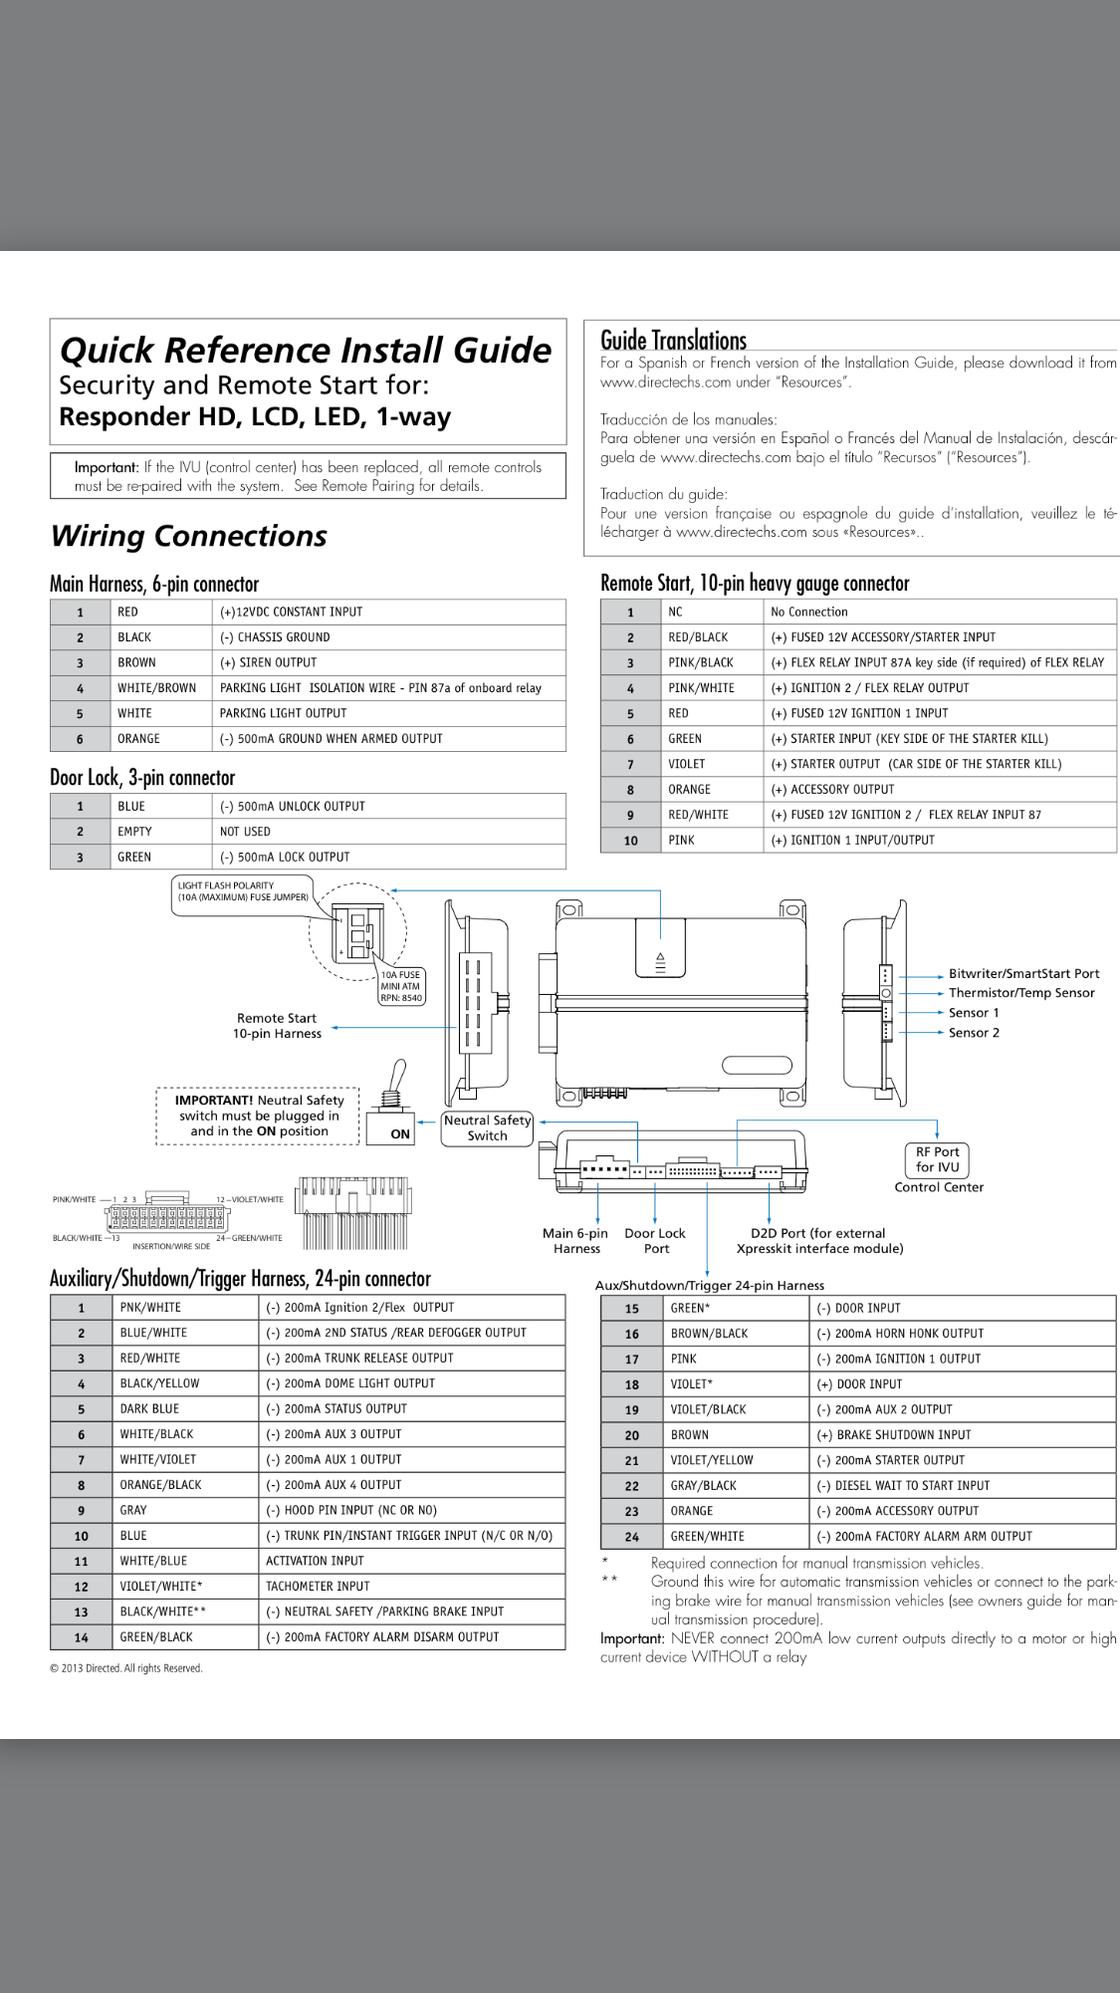 Viper 5706v Wiring Diagram Free Download Wiring Diagram Schematic